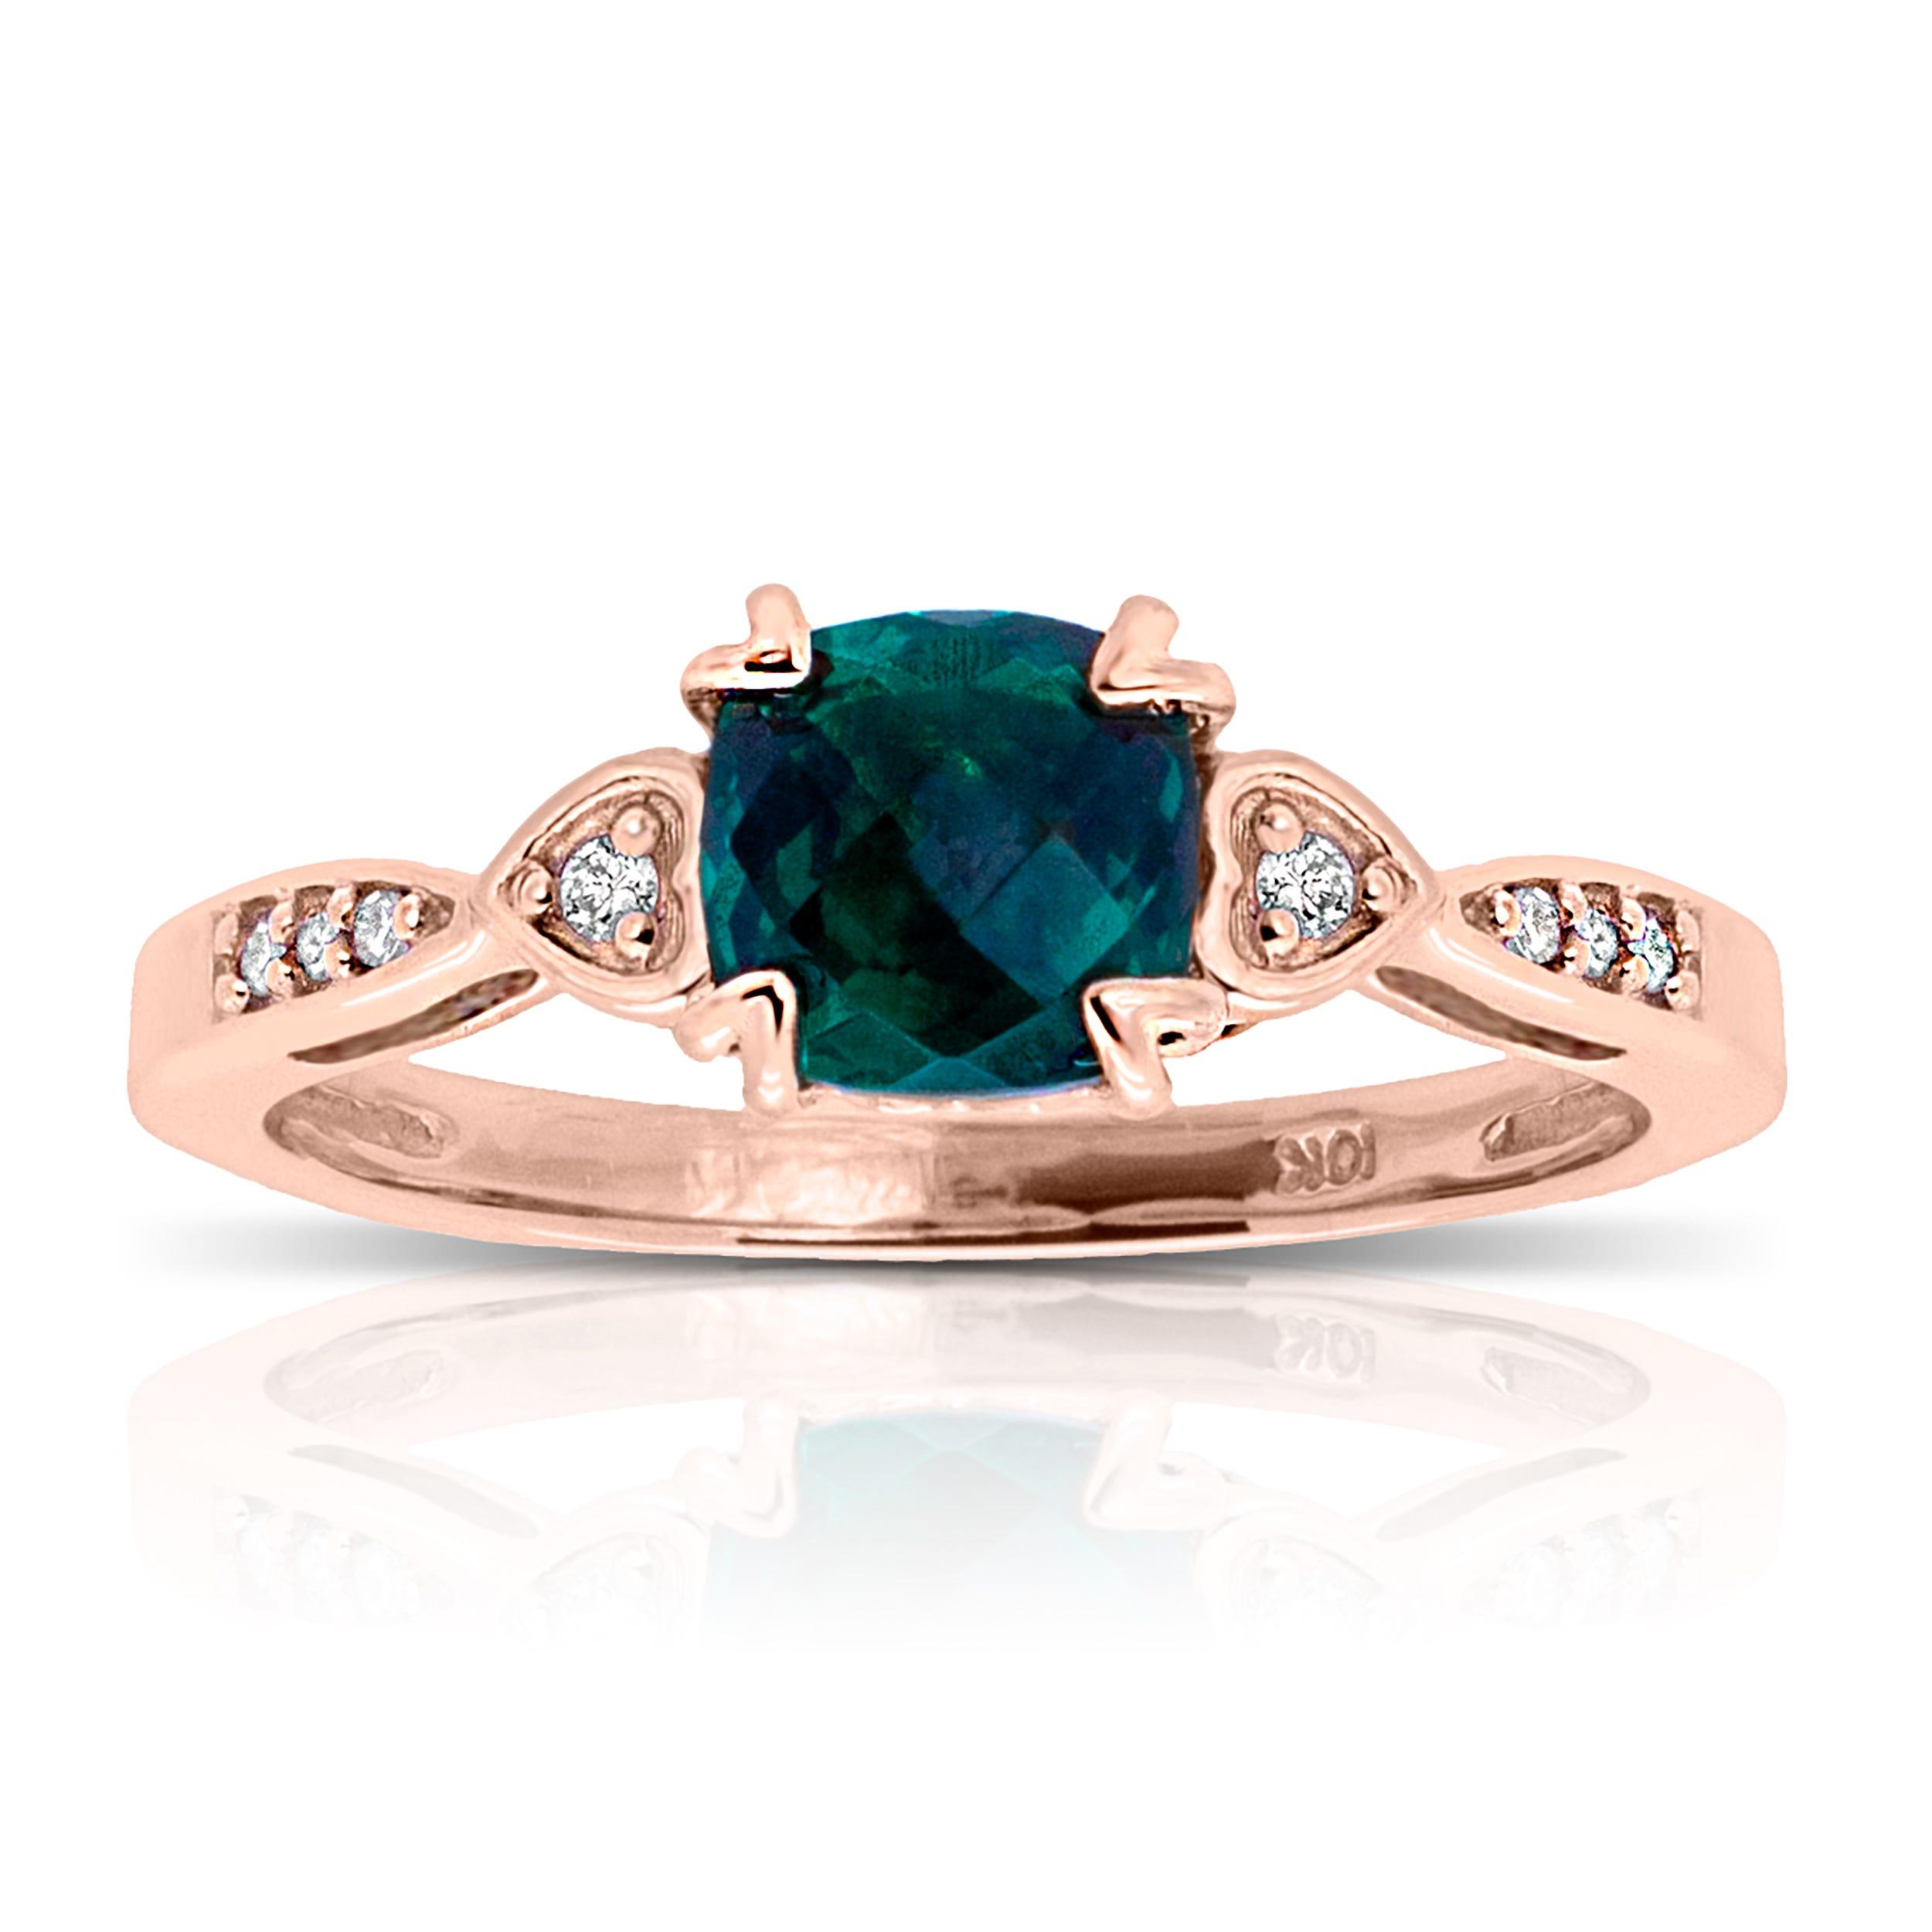 Cushion Created Emerald & Diamond Ring in 10k Rose Gold